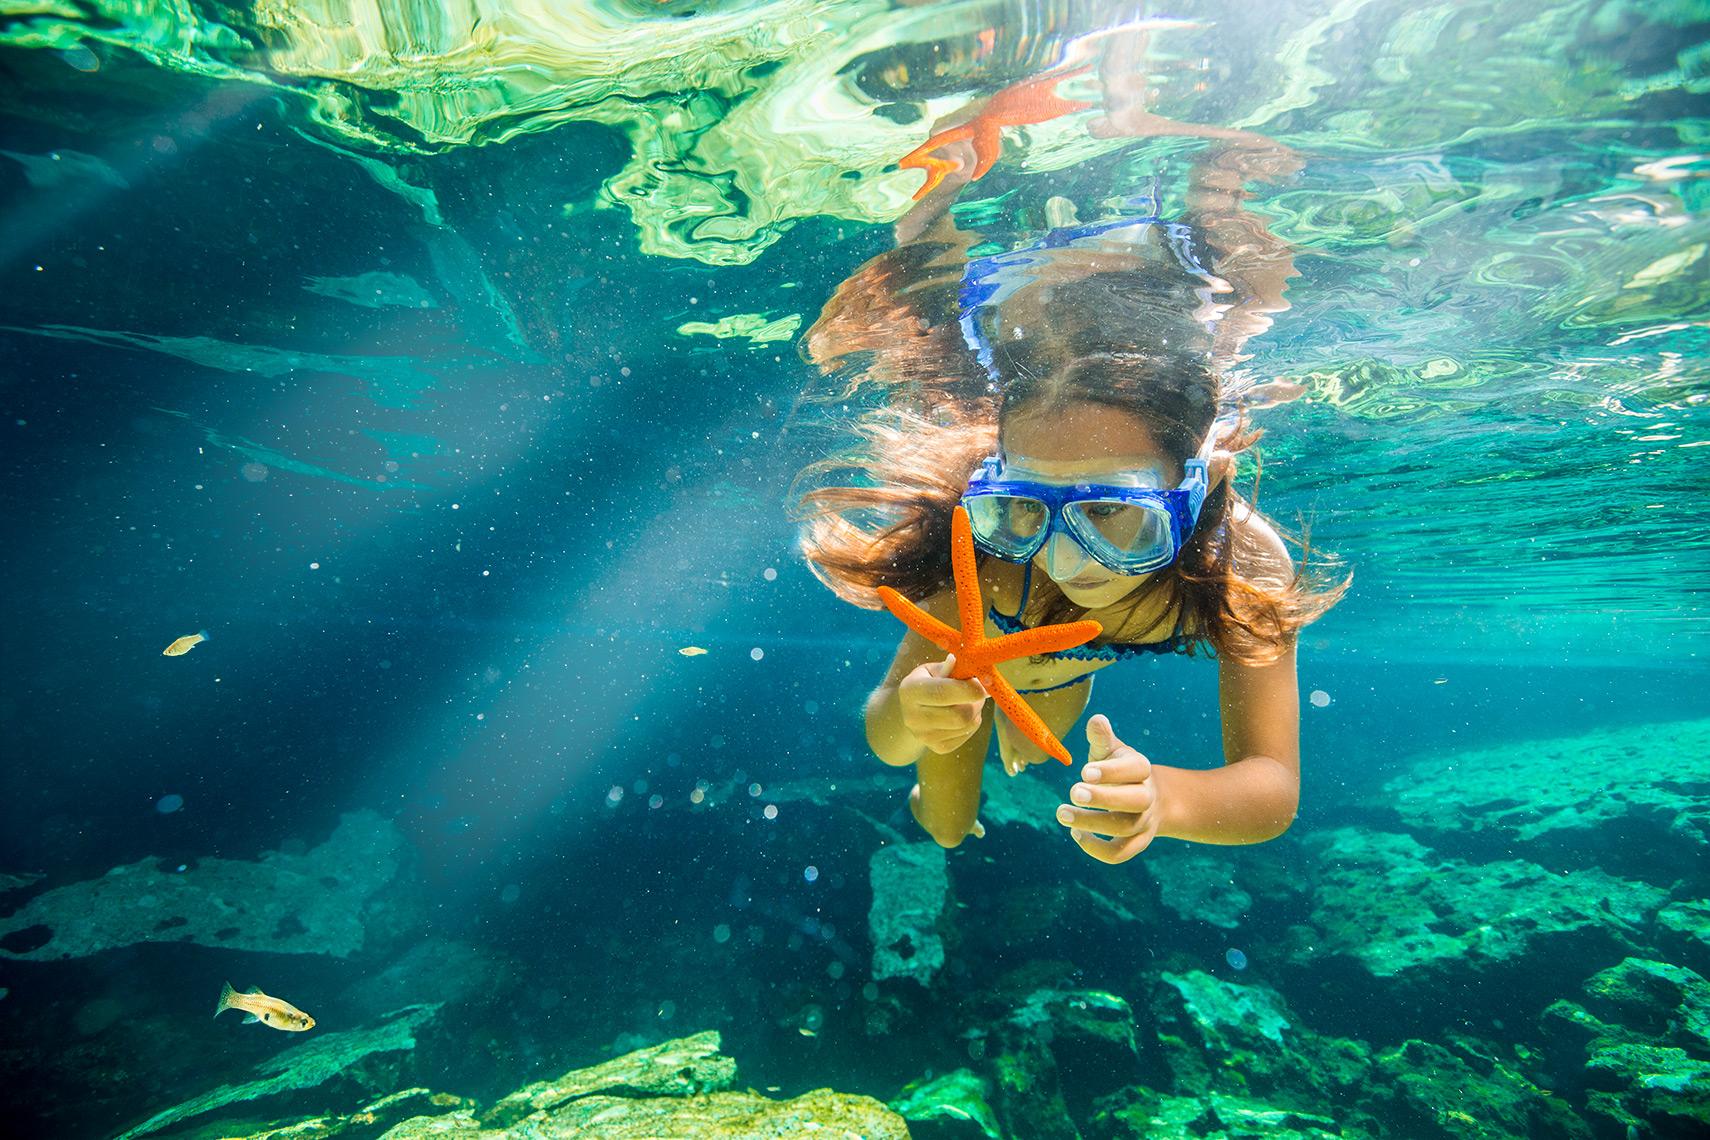 Kids-Starfish-PaladiumMX-6433-1web.jpg